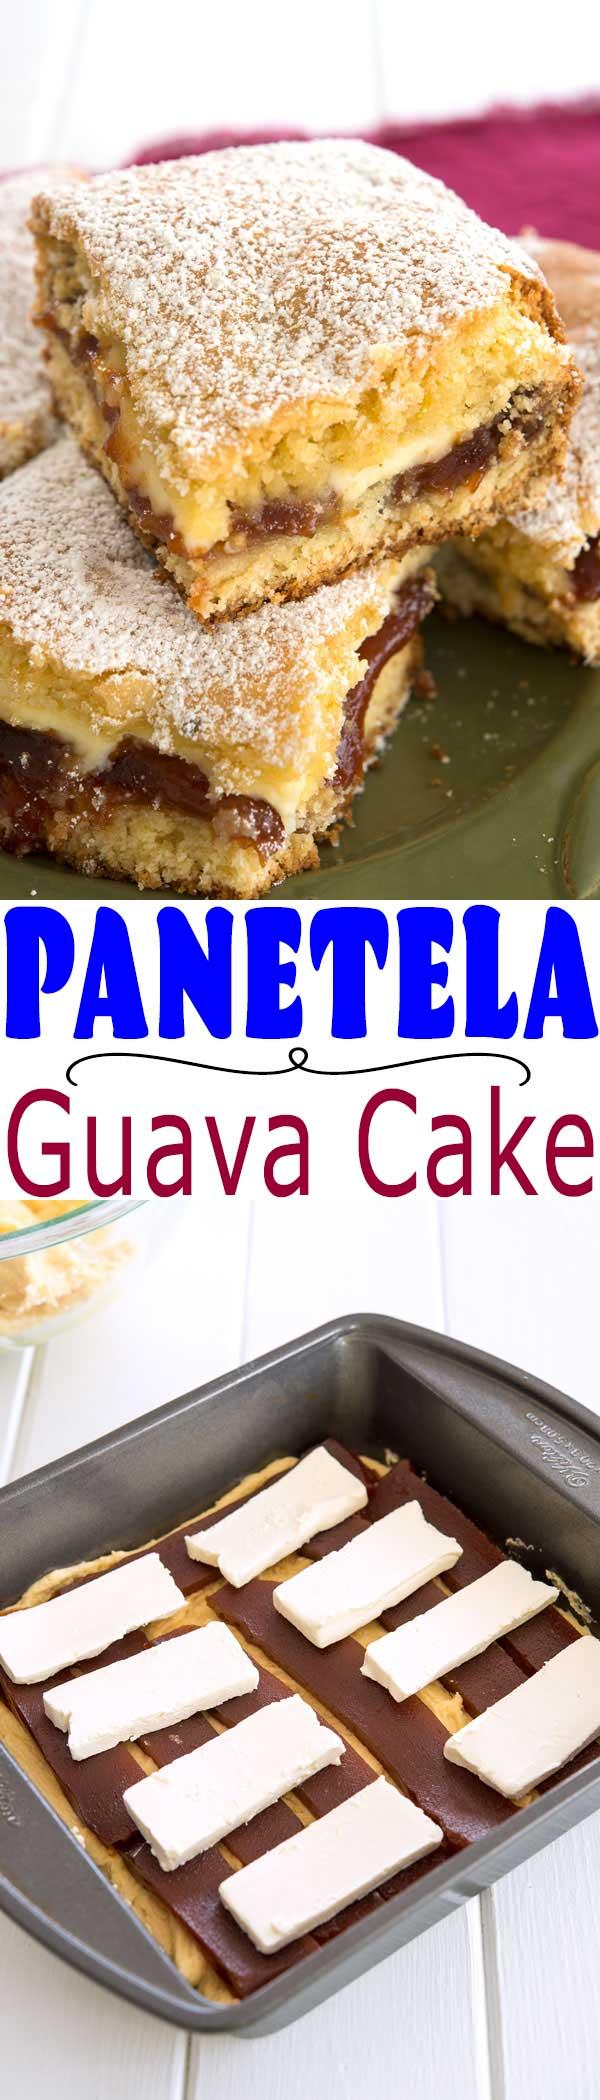 Cream cheese coffee cake meets the Caribbean with this guava cake recipe!   Cubana Panetela de Guayaba receta